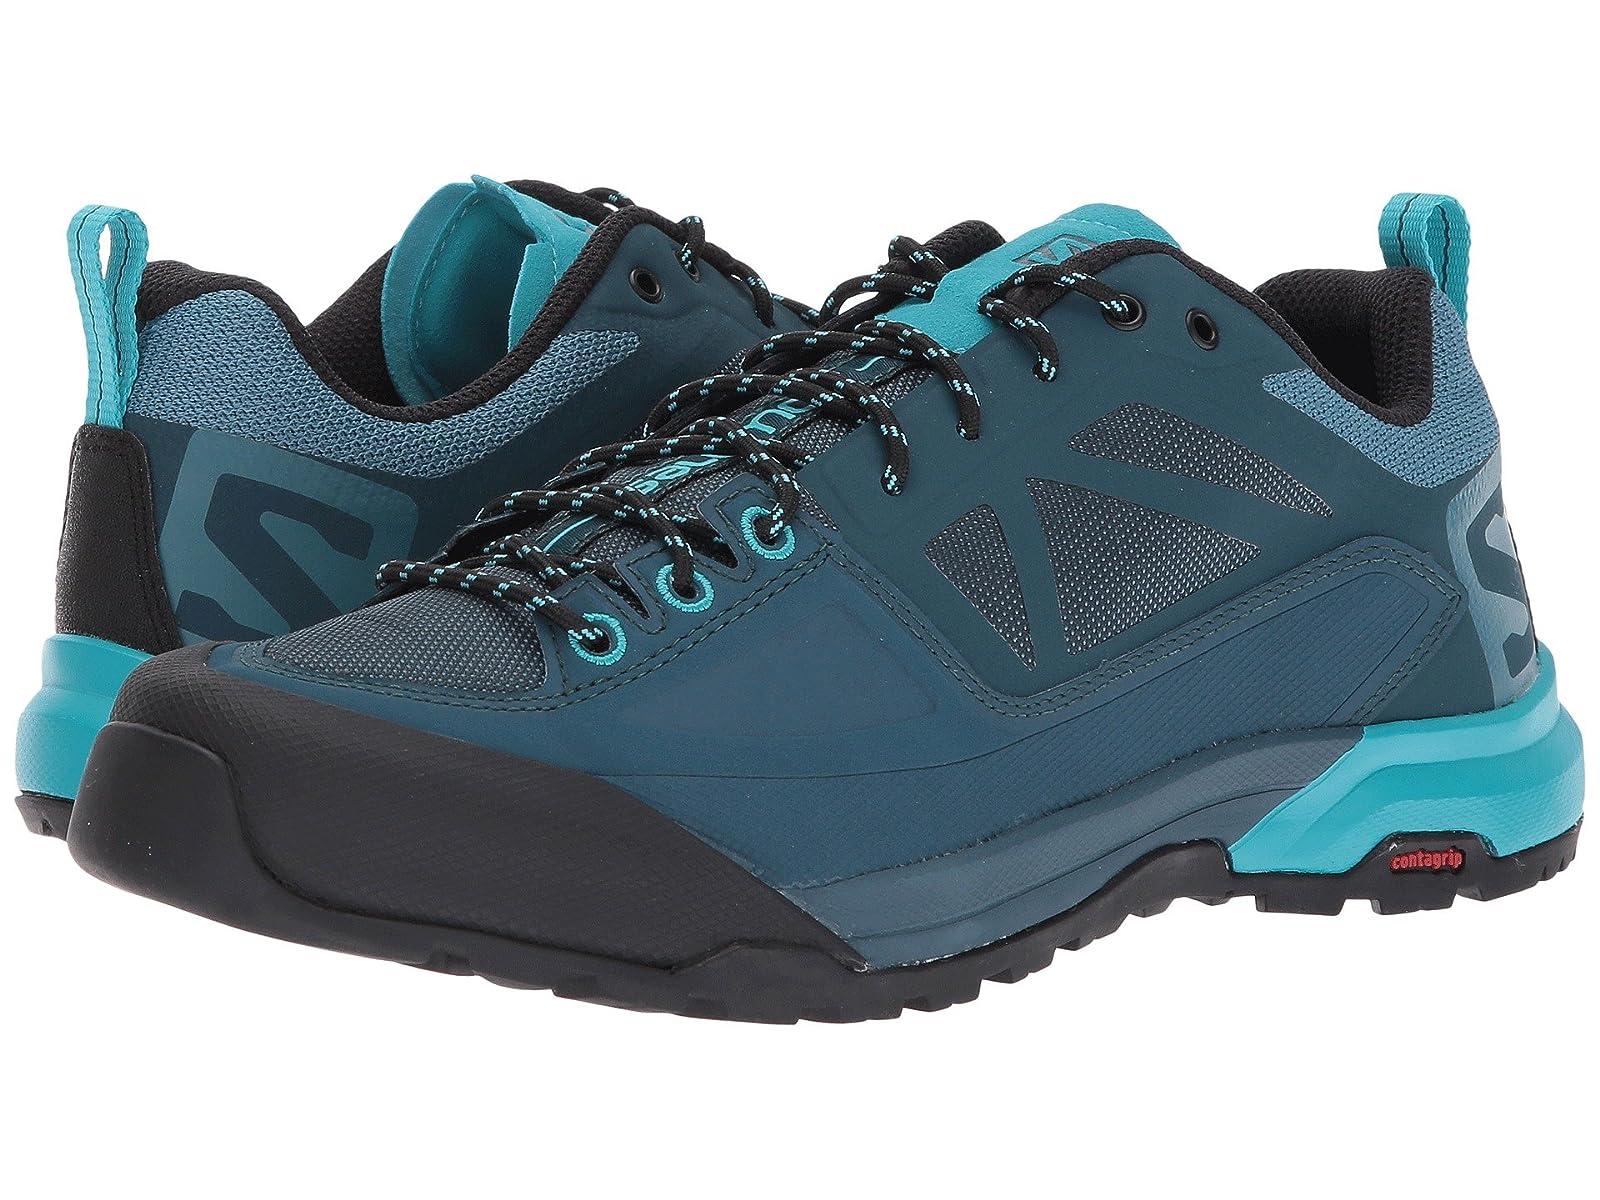 Salomon X Alp SpryAtmospheric grades have affordable shoes